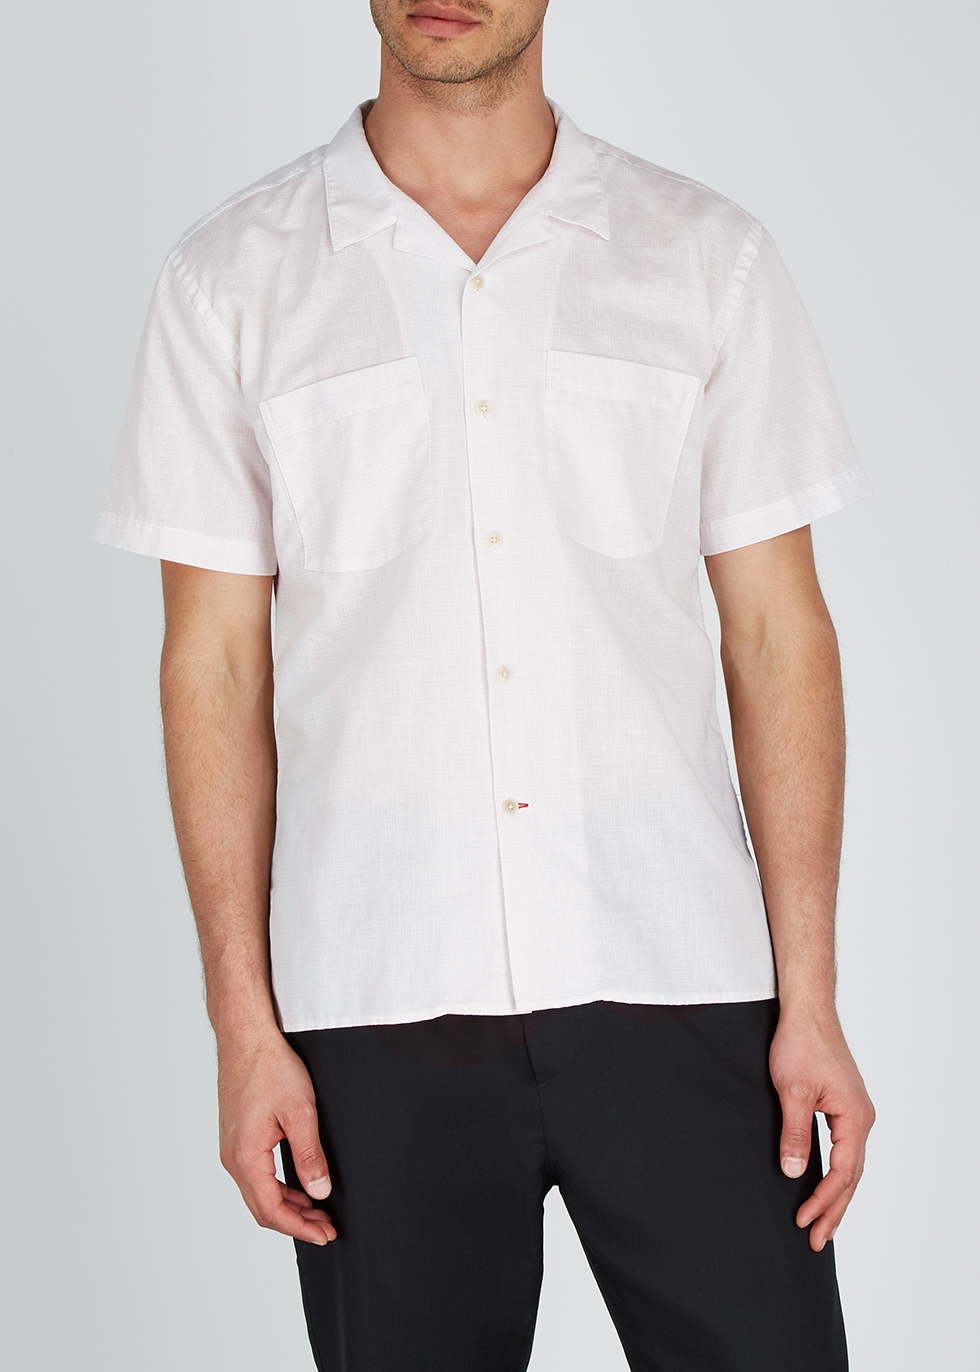 Ivory checked cotton-blend shirt - Oliver Spencer